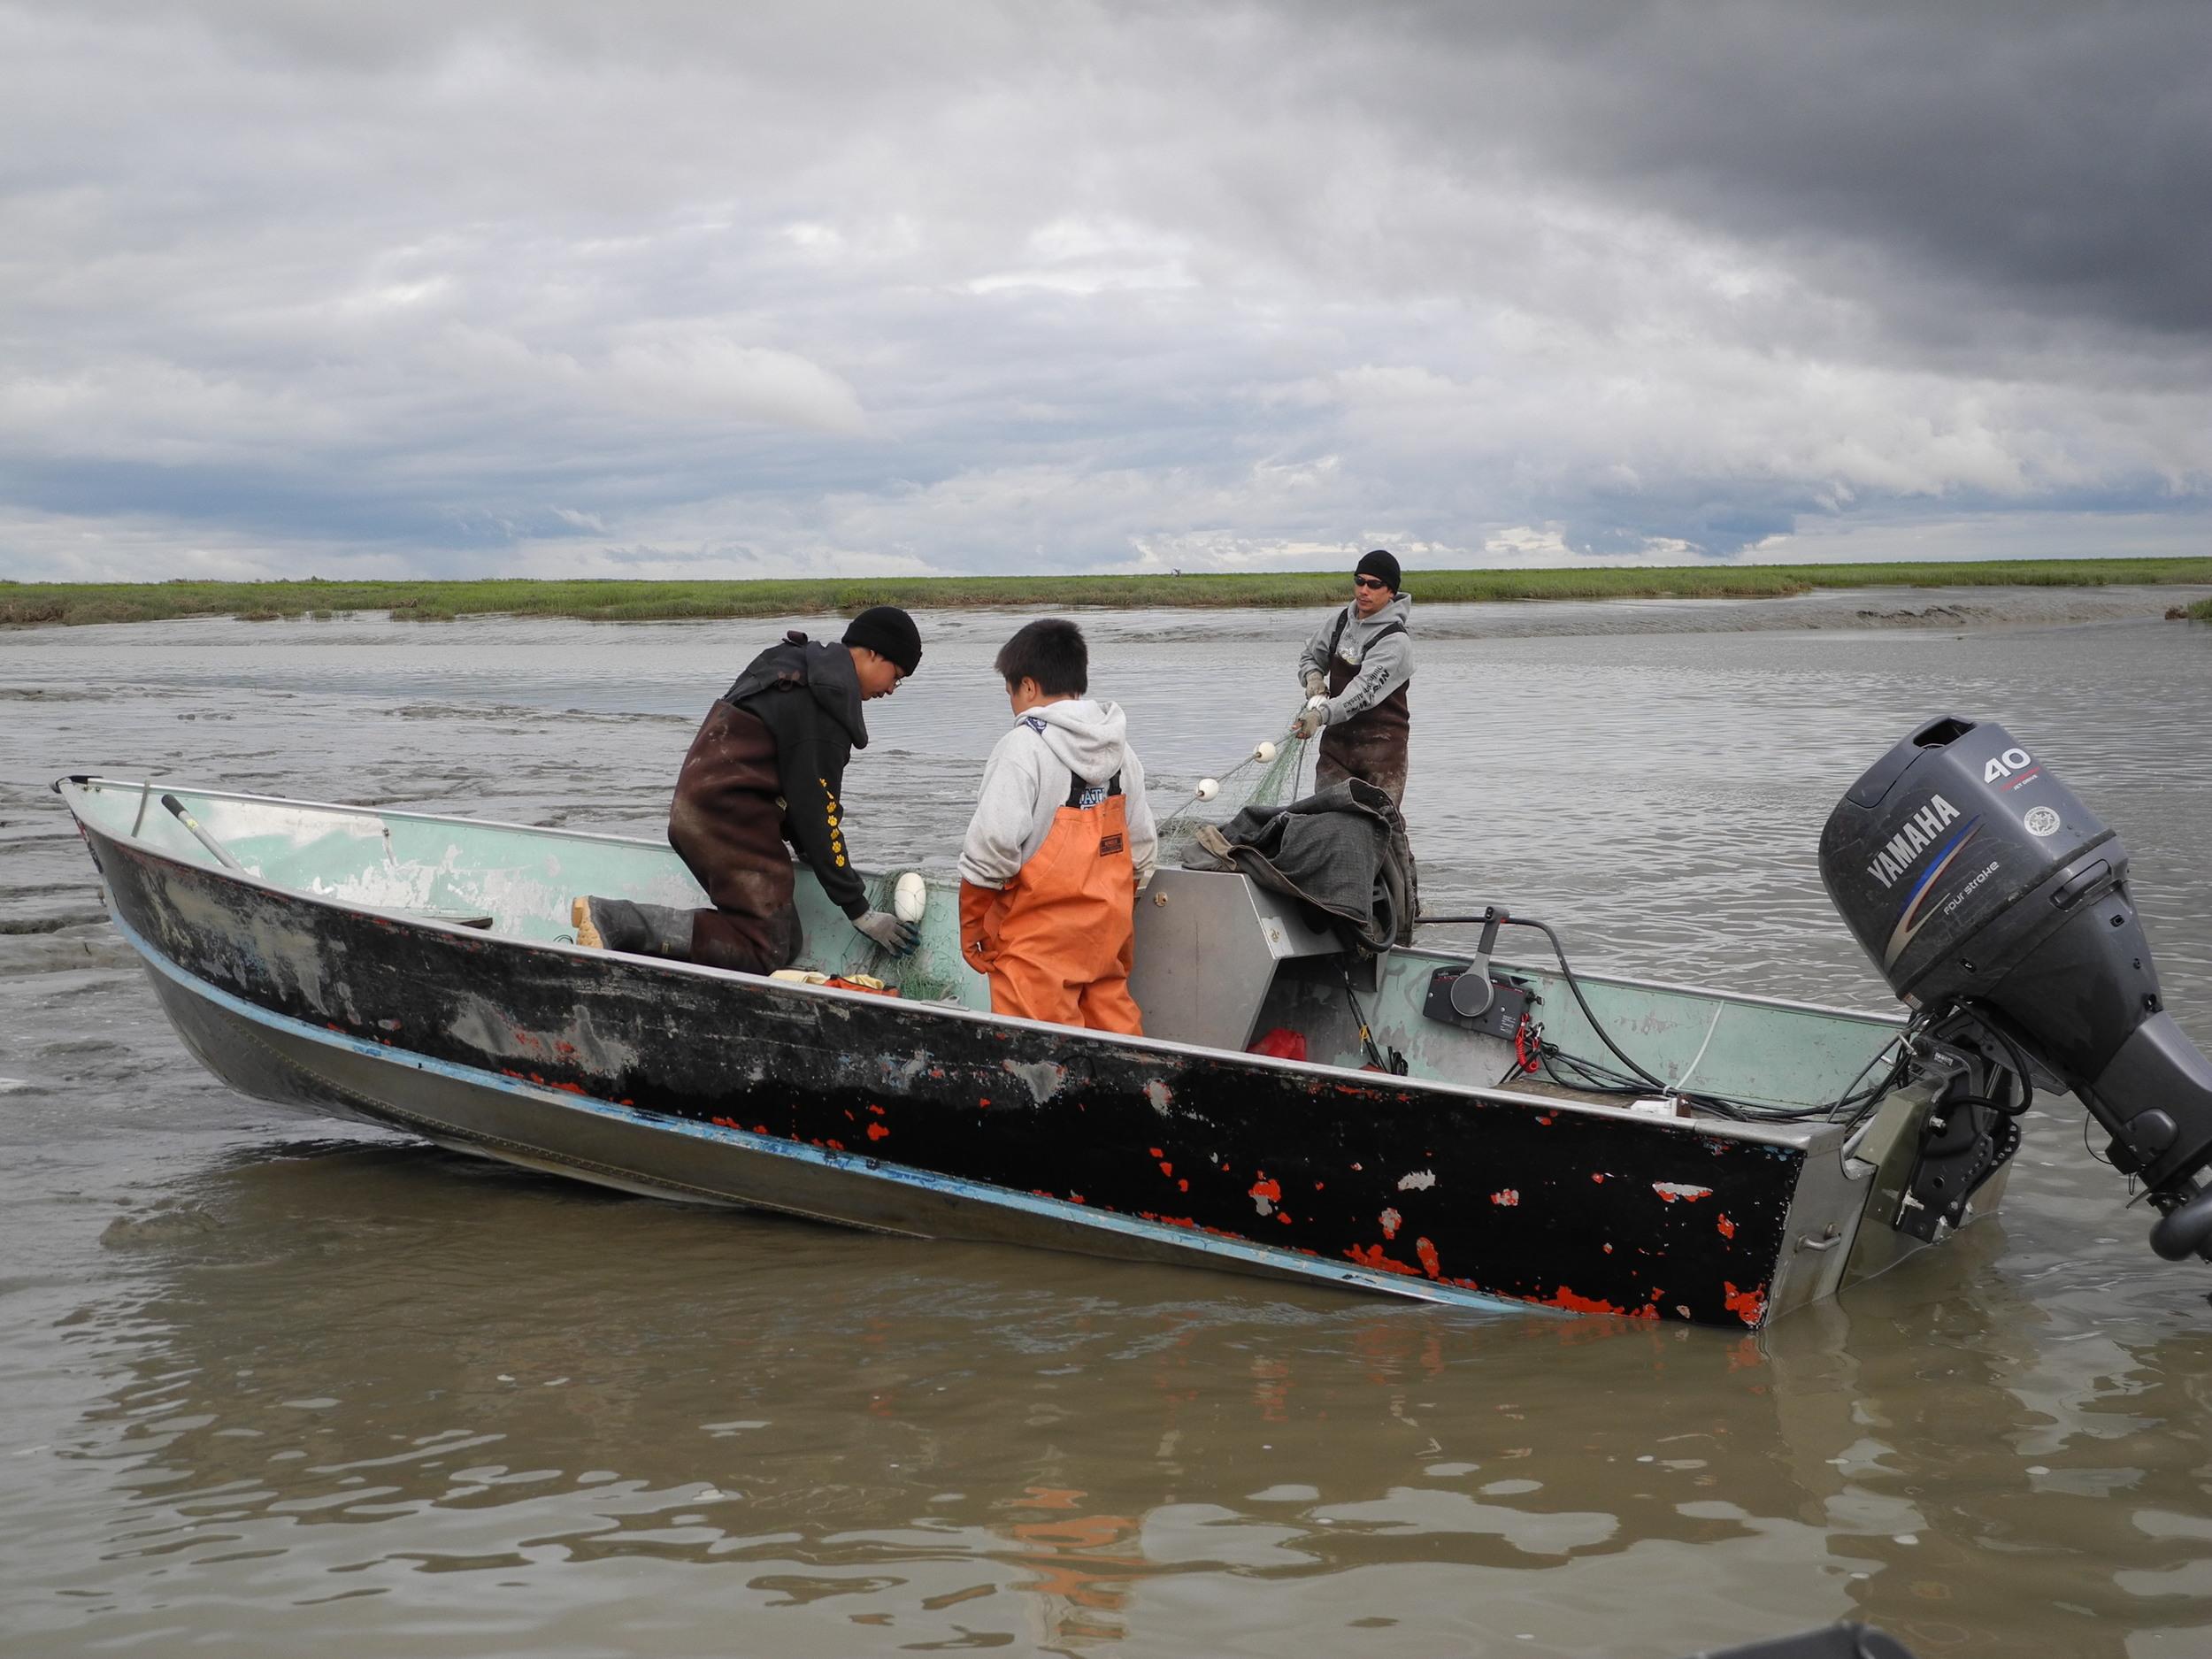 Subsistence fishing in Bristol Bay, AK.